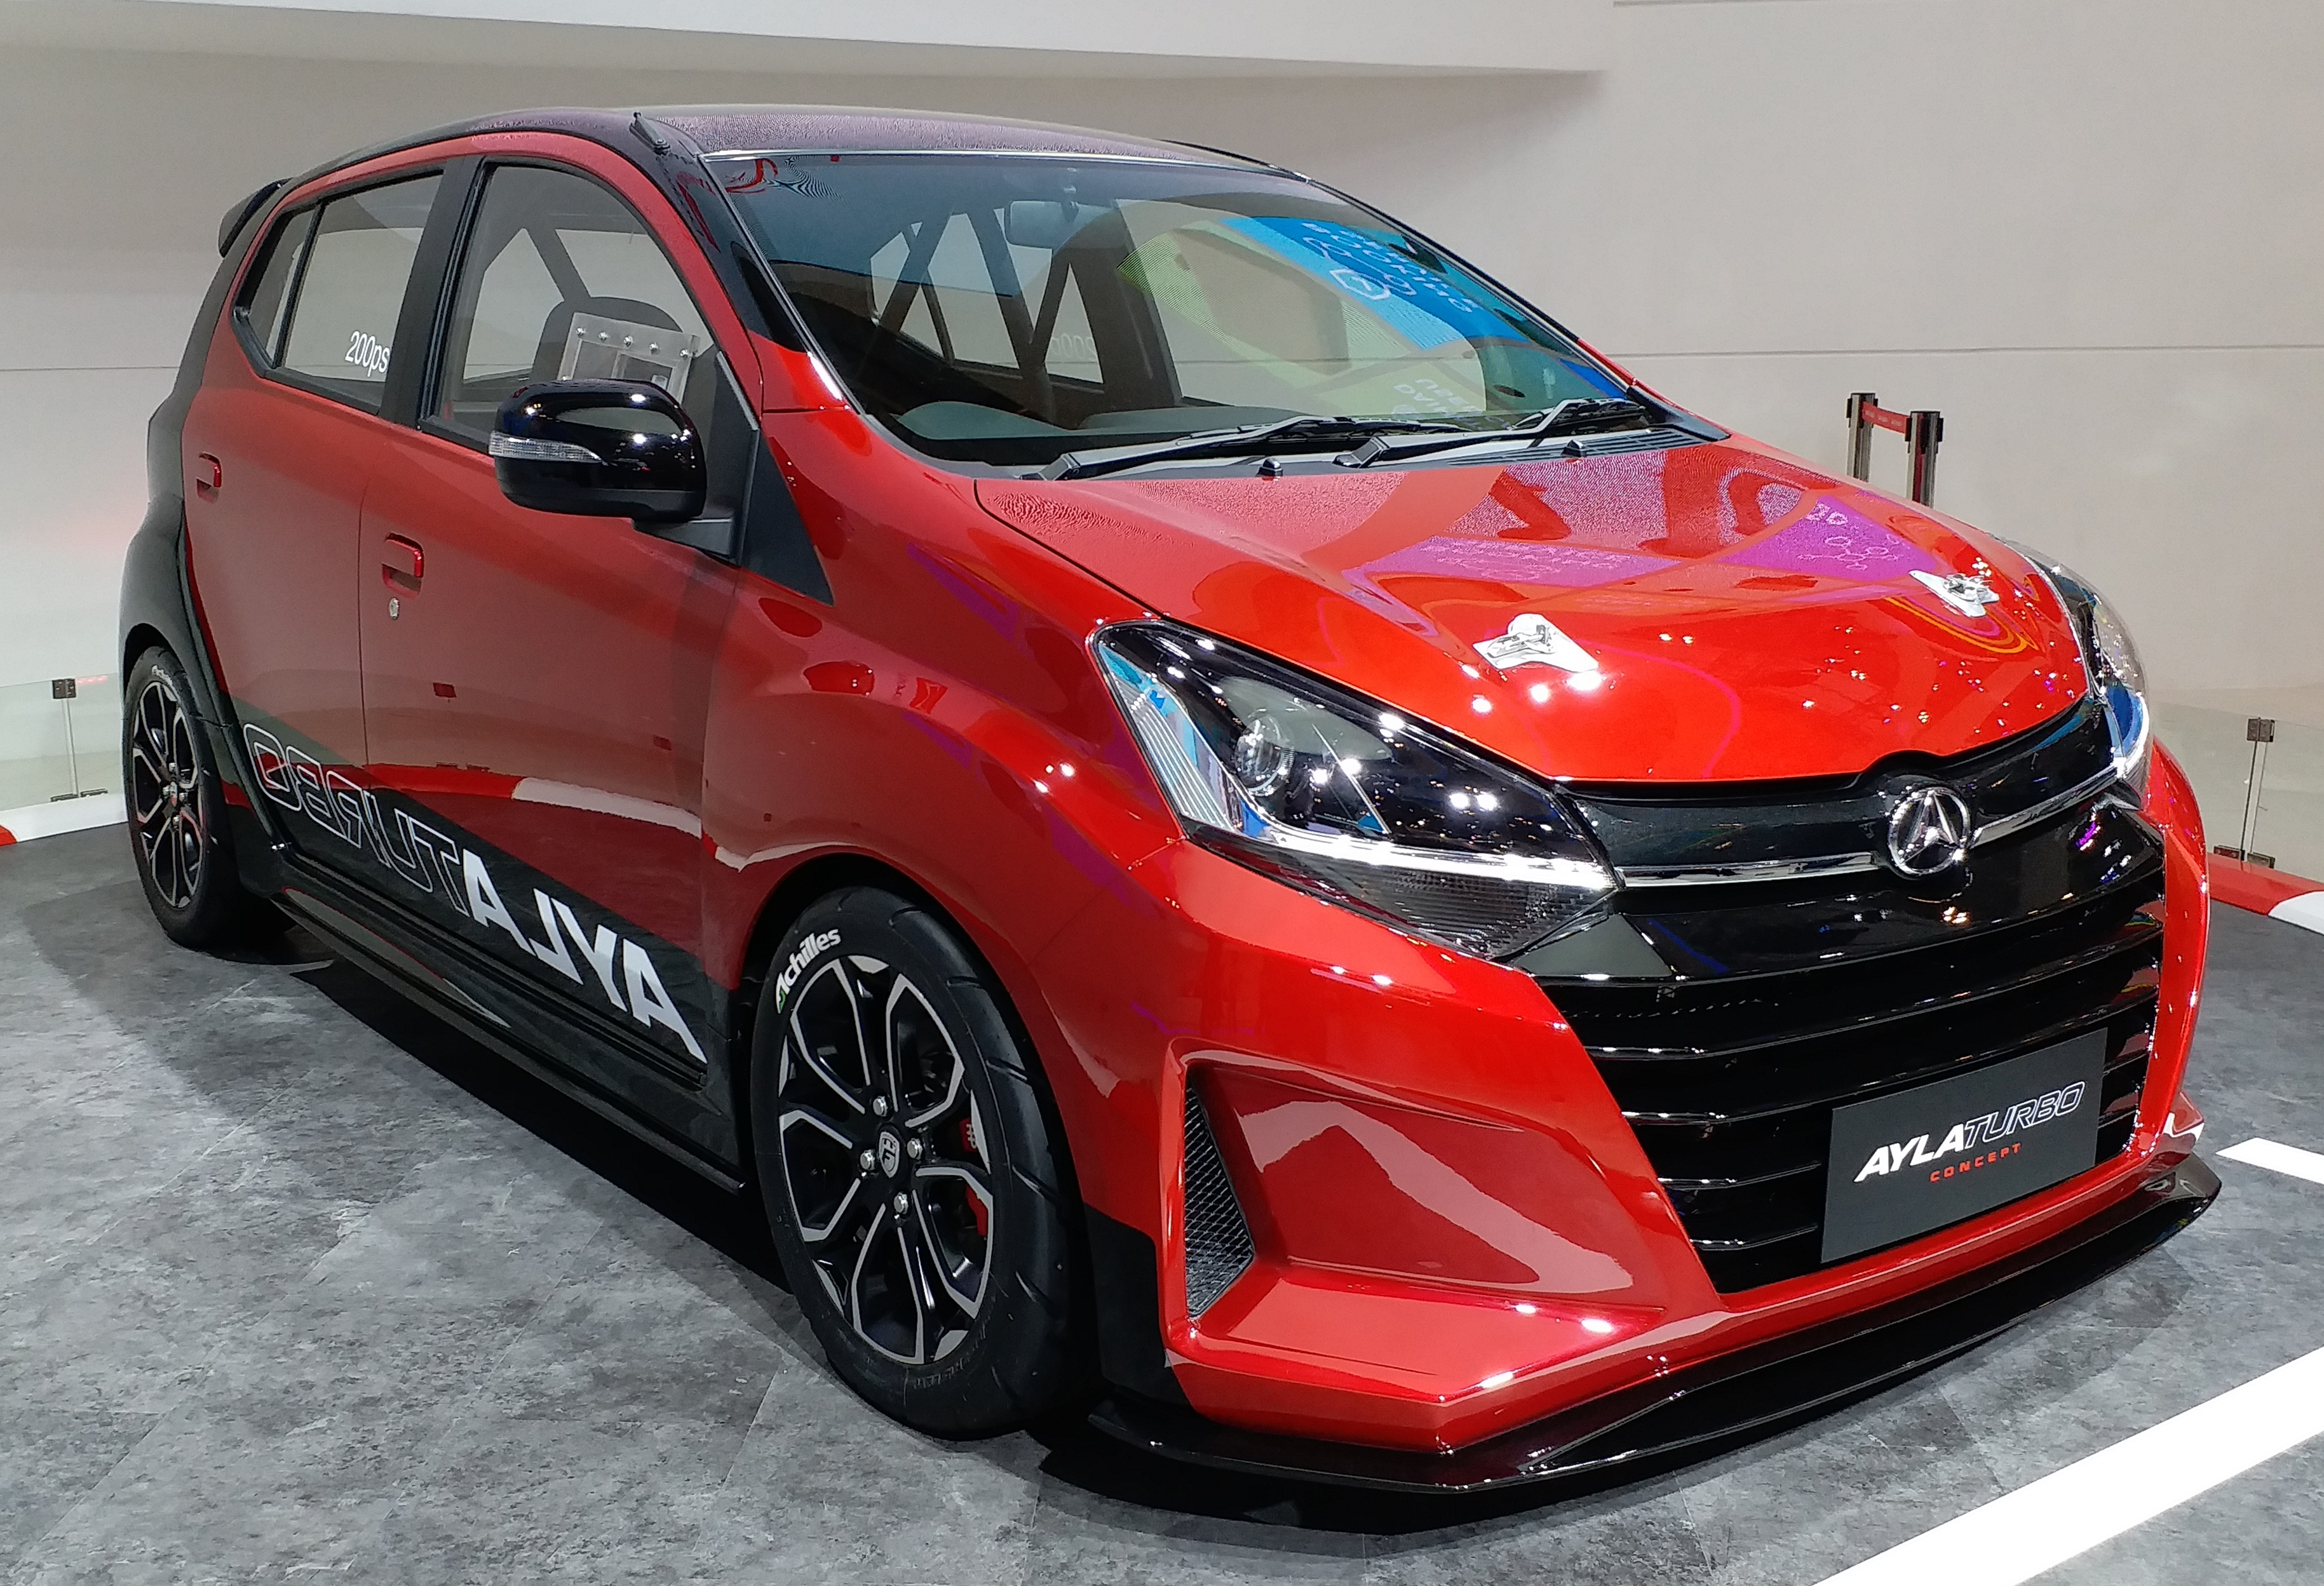 File:Daihatsu Ayla Turbo Concept - Gaikindo Indonesia International